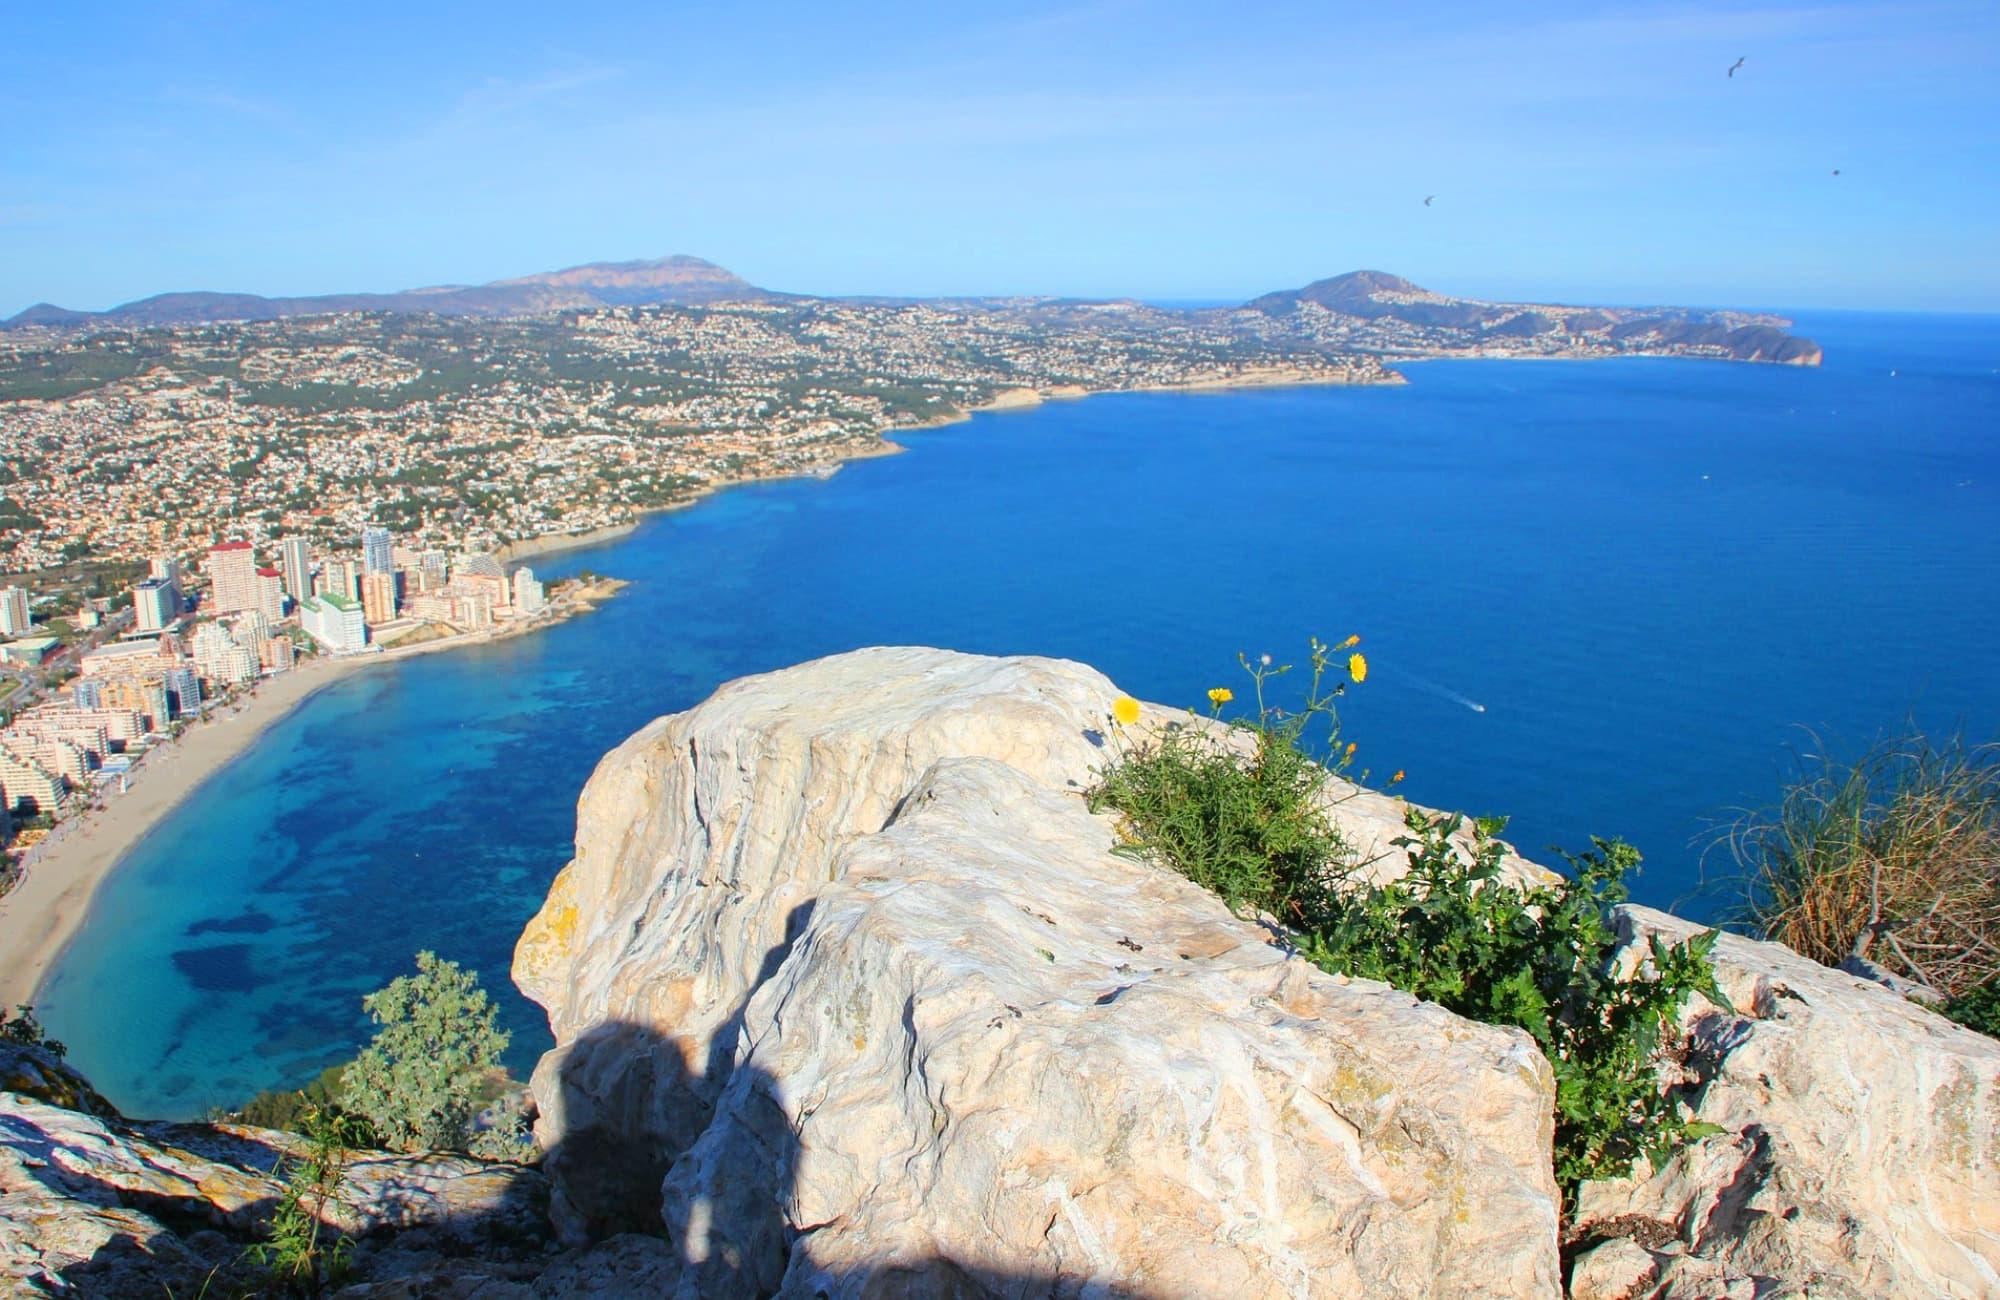 Balcon sur la Méditerranée, depuis Peñón de Ifach